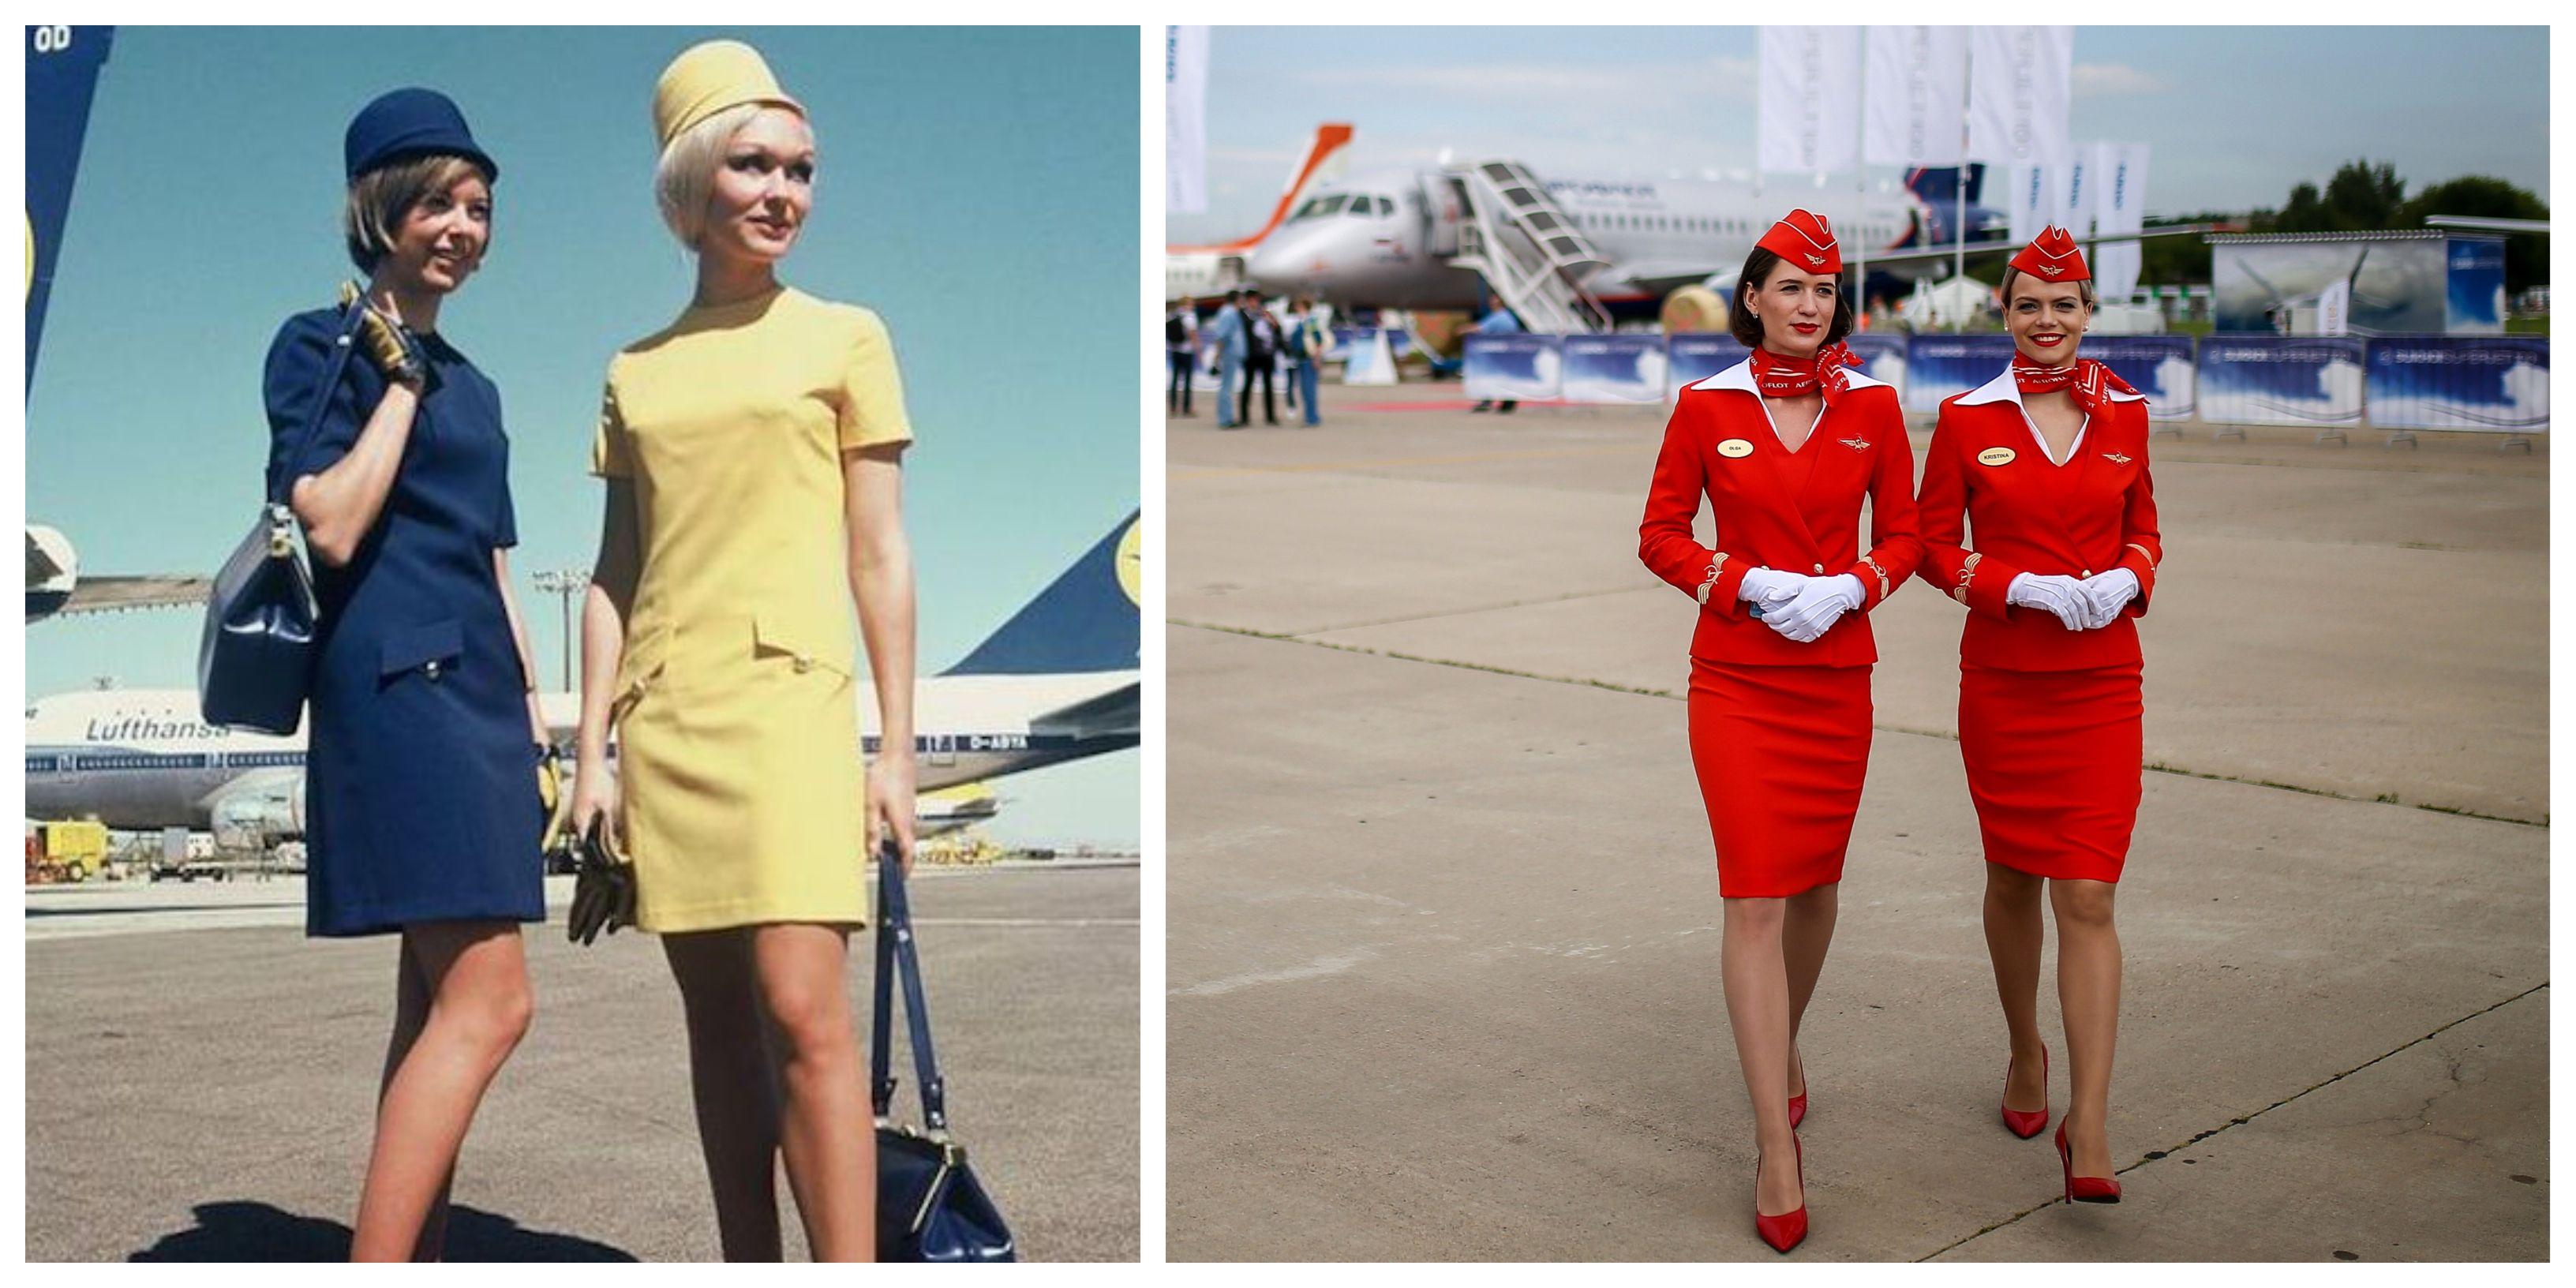 RED RETRO FLIGHT ATTENDANT STEWARDESS UNIFORM DRESS UP 60S 70S AIRLINE COSTUME